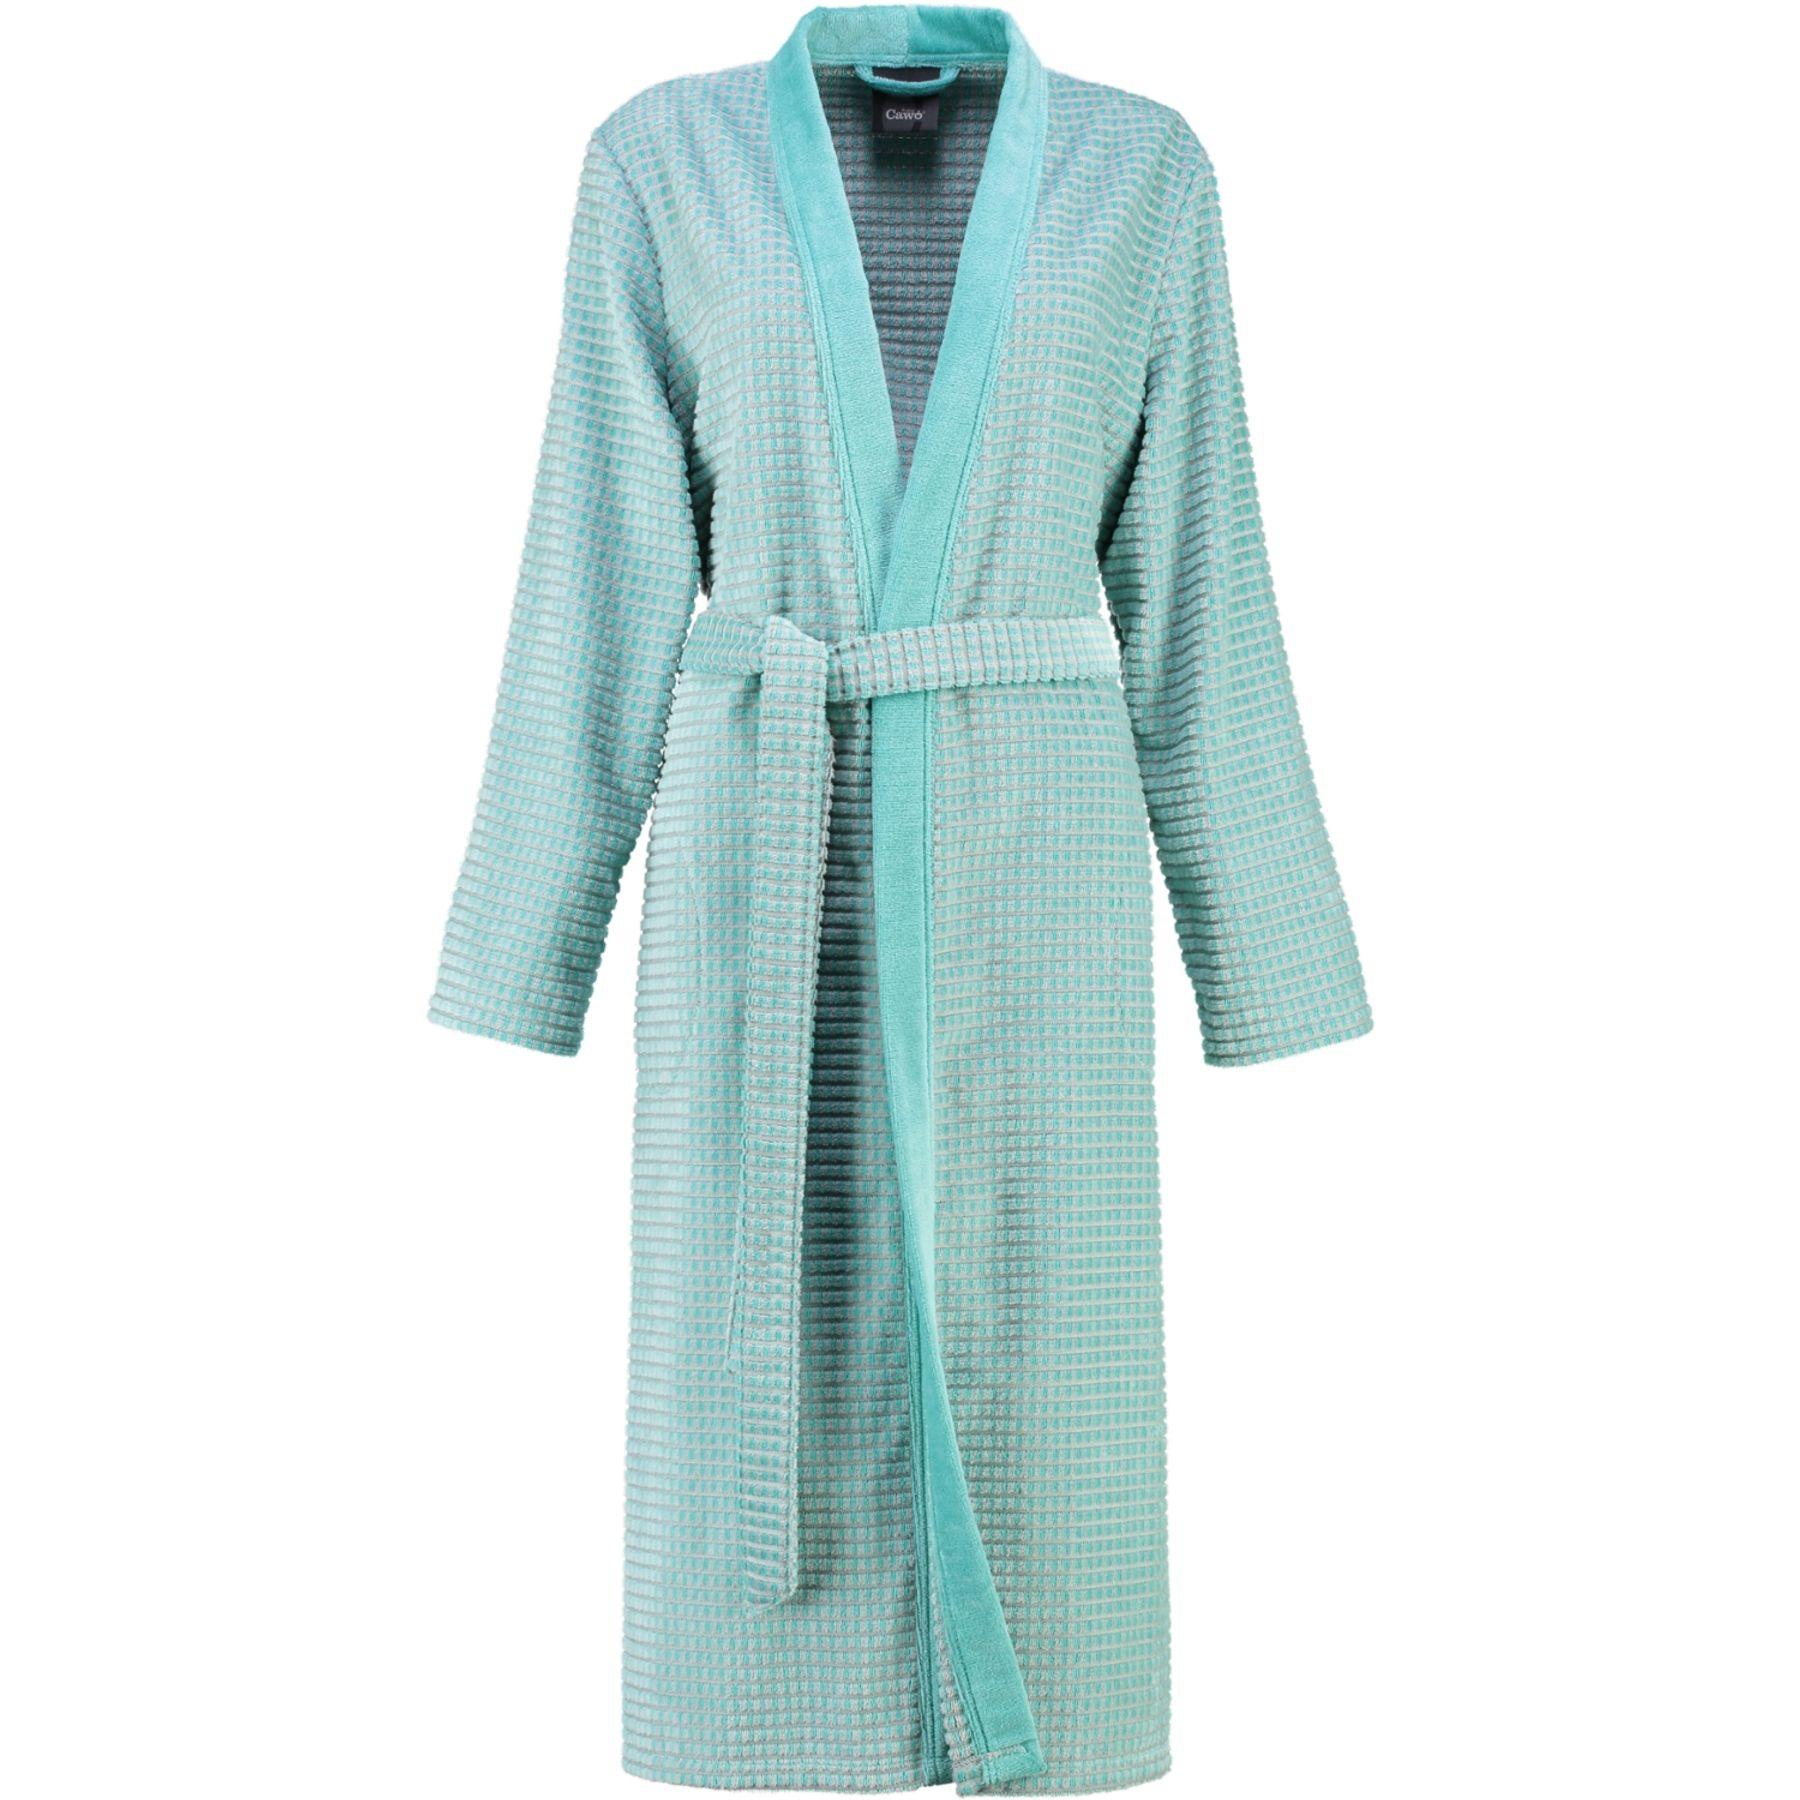 Cawö - Damen Walkvelours-Bademantel in Kimono-Form (4346) – Bild 4